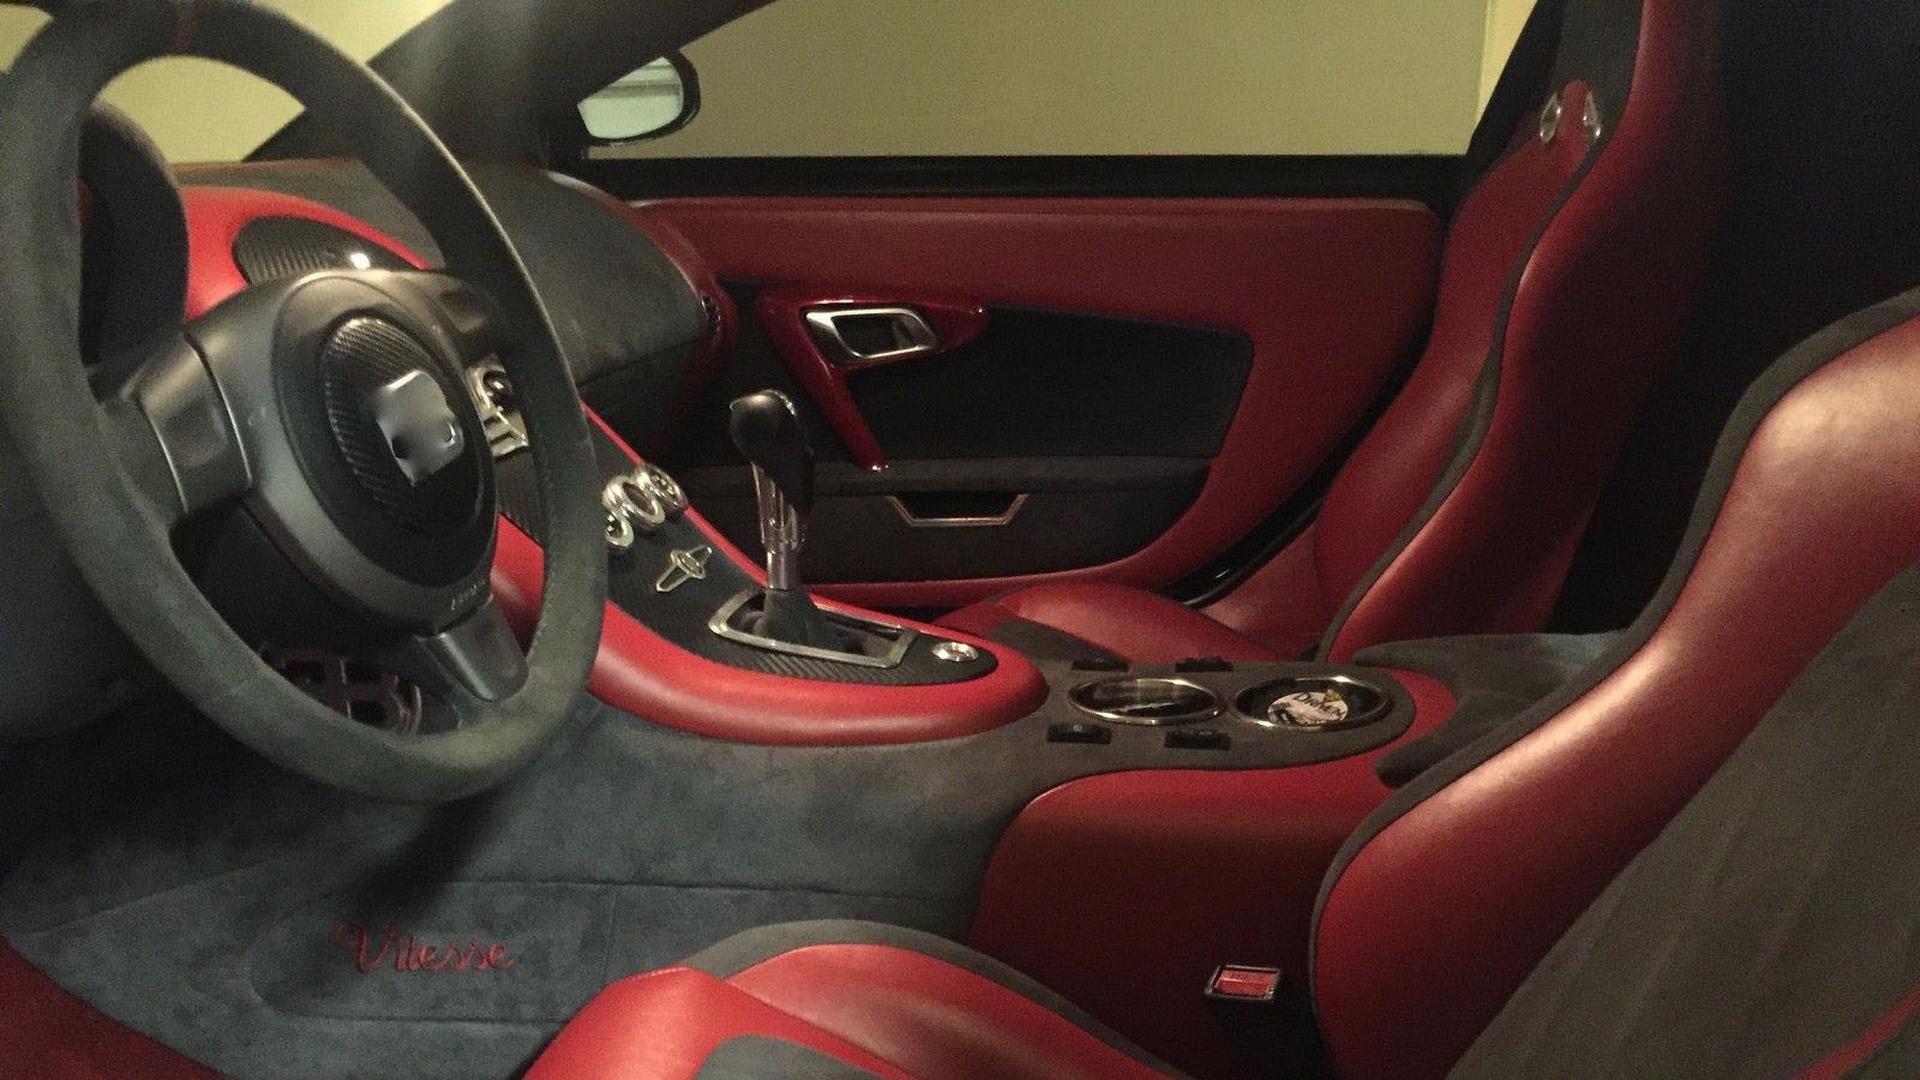 2015 bugatti veyron picture gallery photo 39 the car. Black Bedroom Furniture Sets. Home Design Ideas